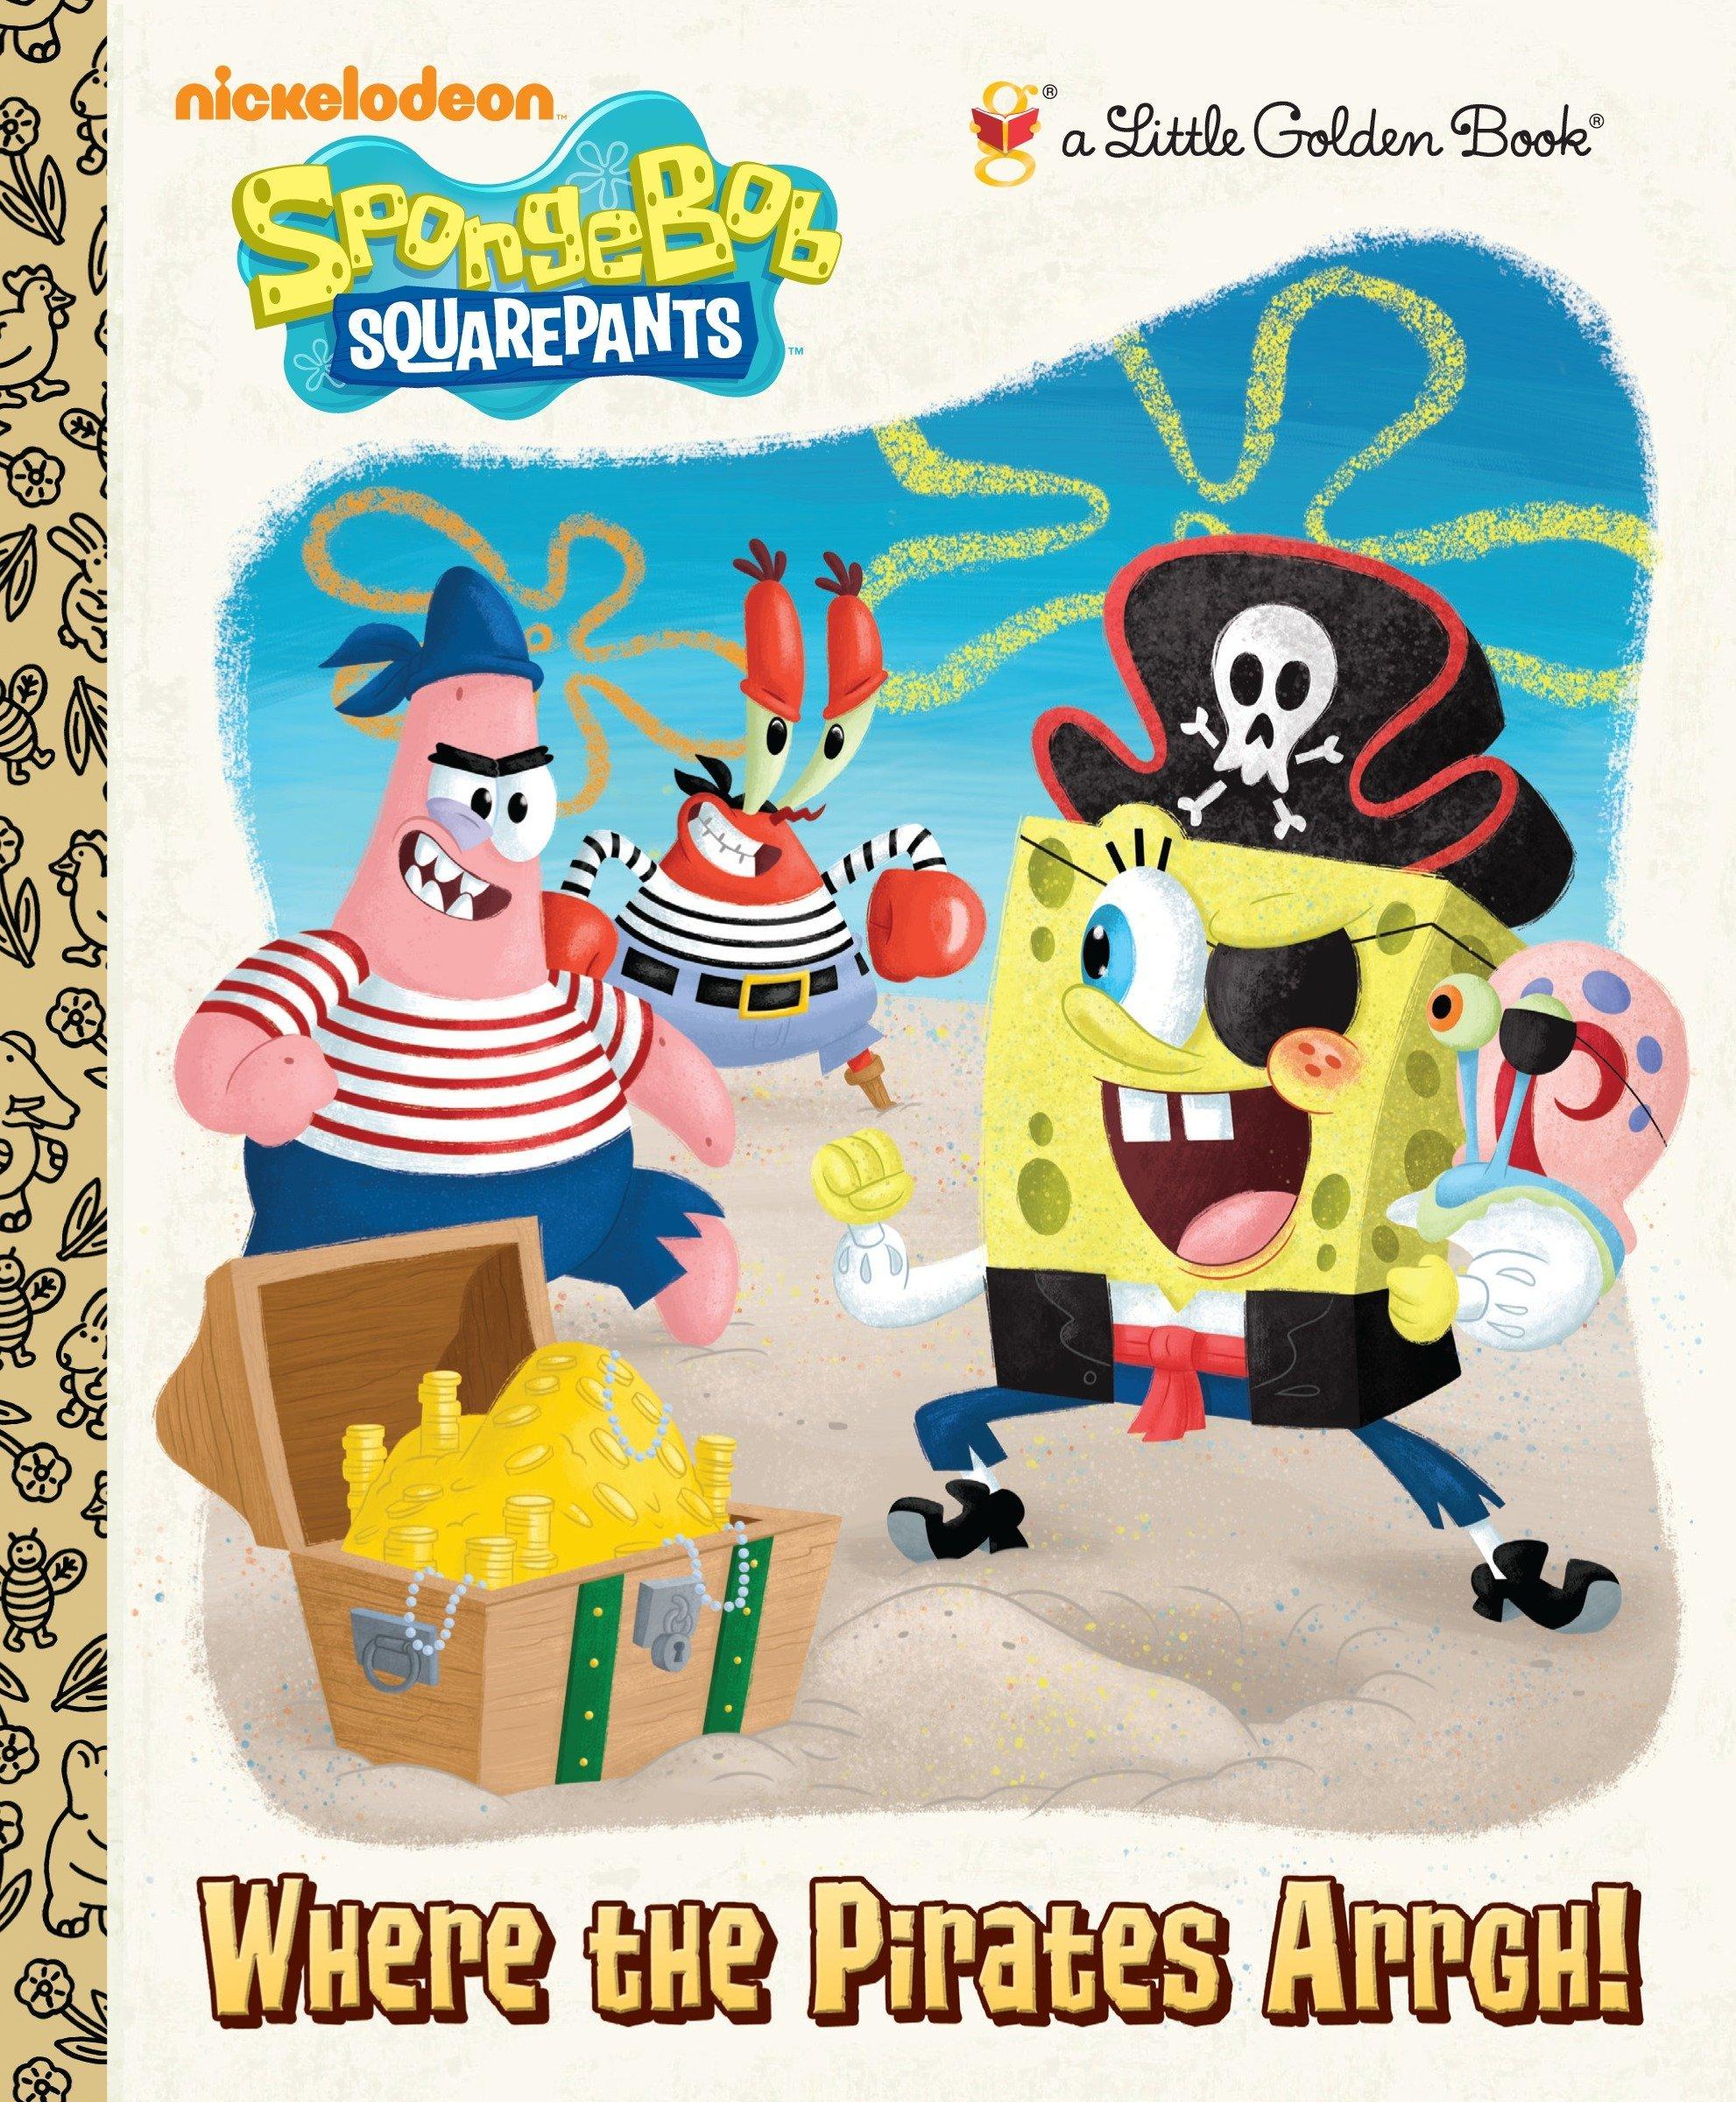 Where the Pirates Arrgh!